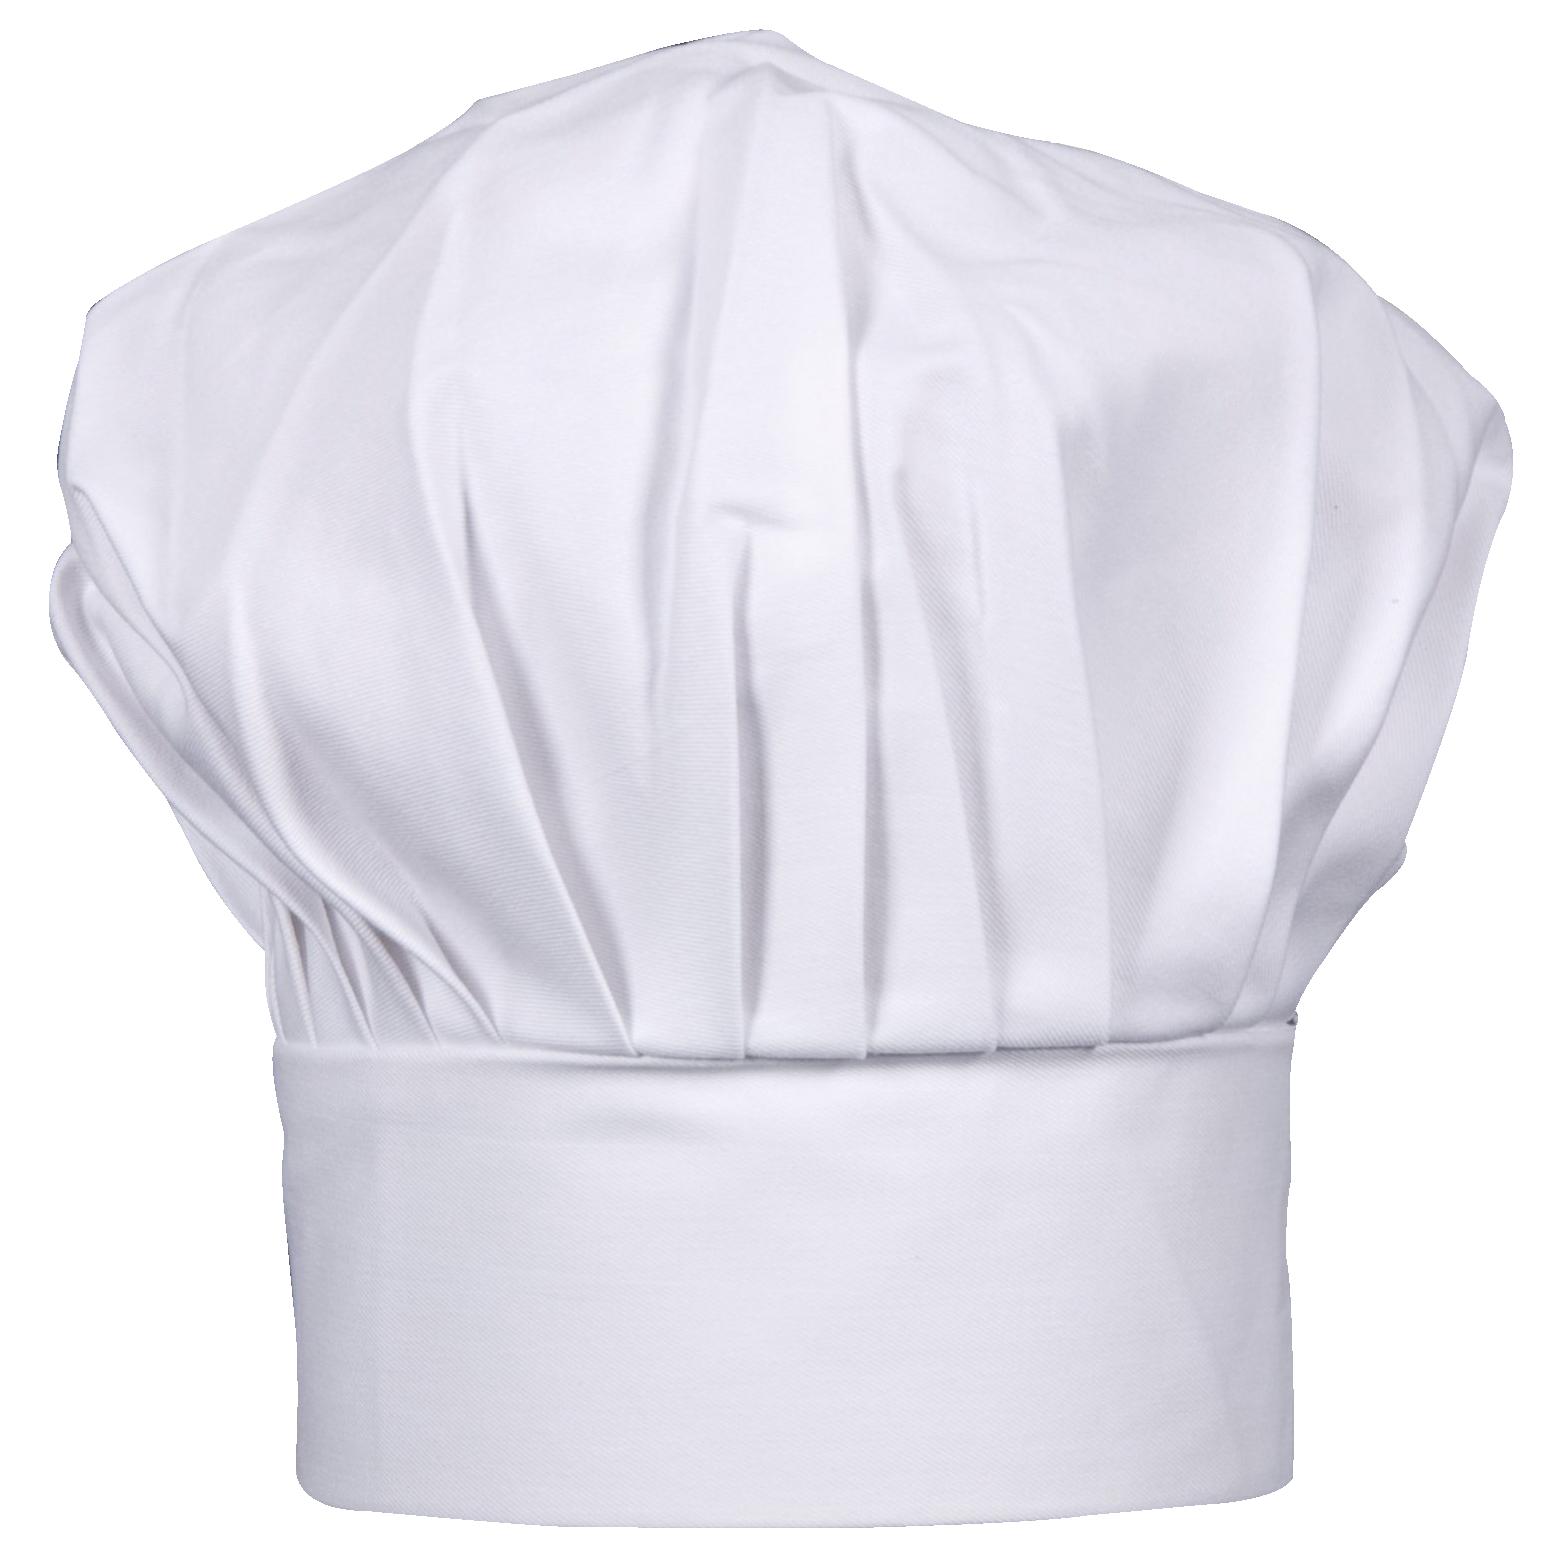 Cook Cap PNG Image